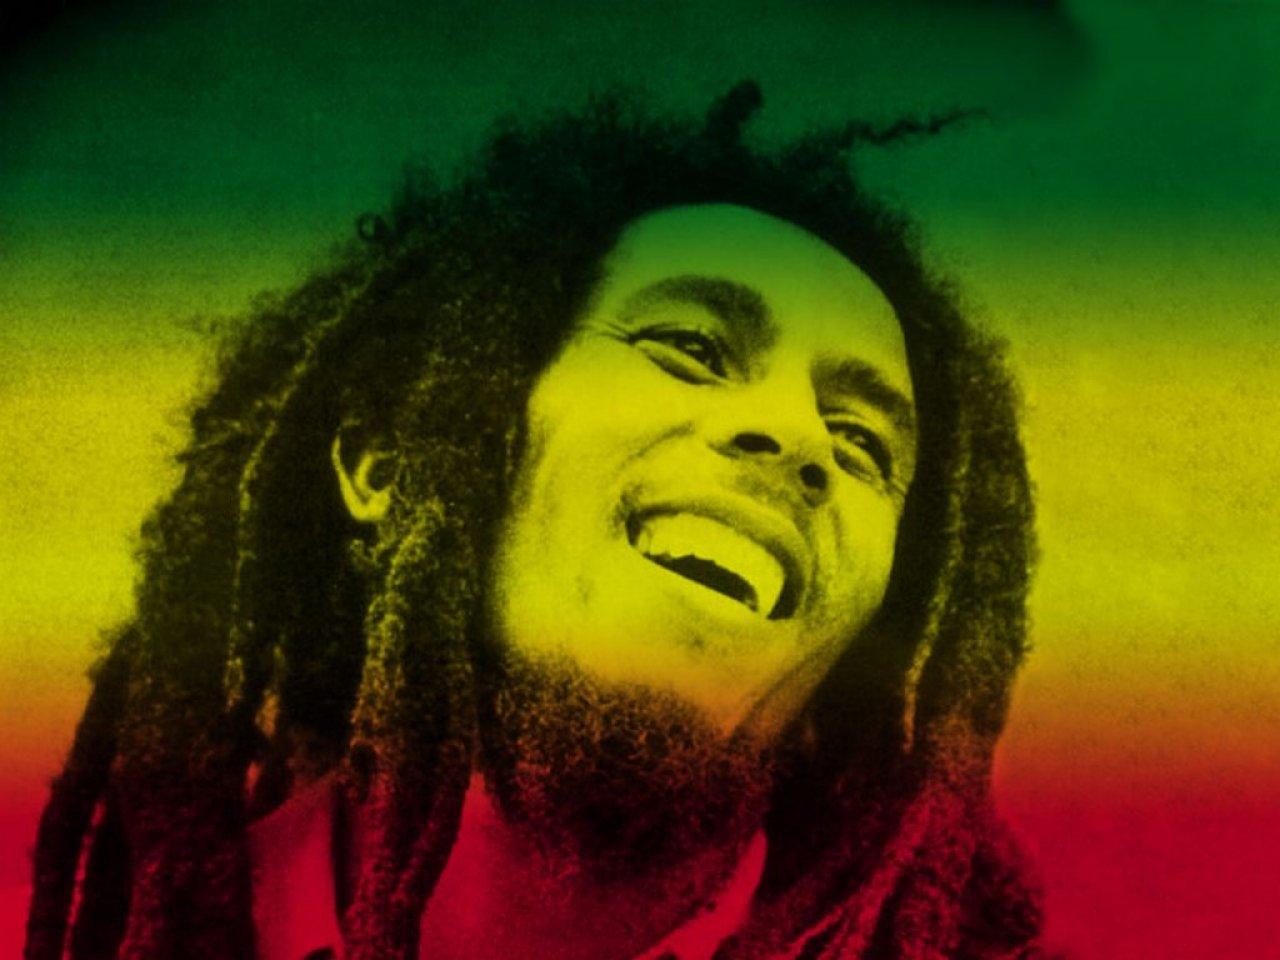 Bob Marley Wallpaper Hd Iphone 6 Fondos Para Whatsapp Patada De Caballo Bob Marley